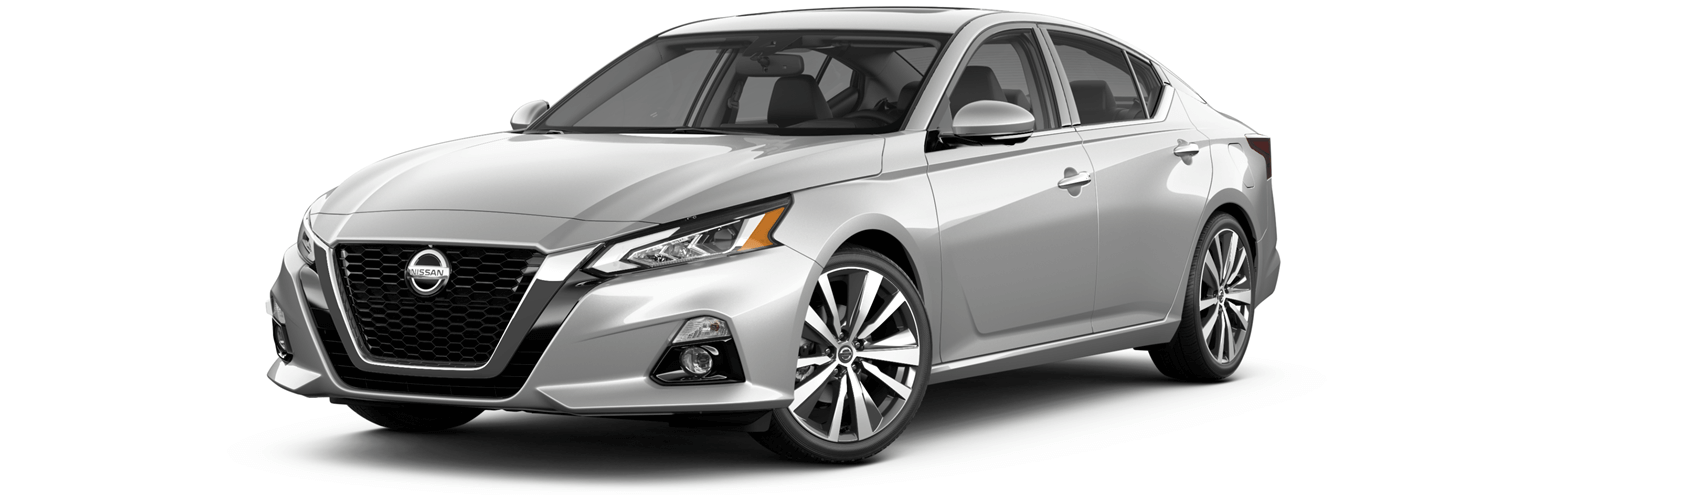 Nissan Altima Specs